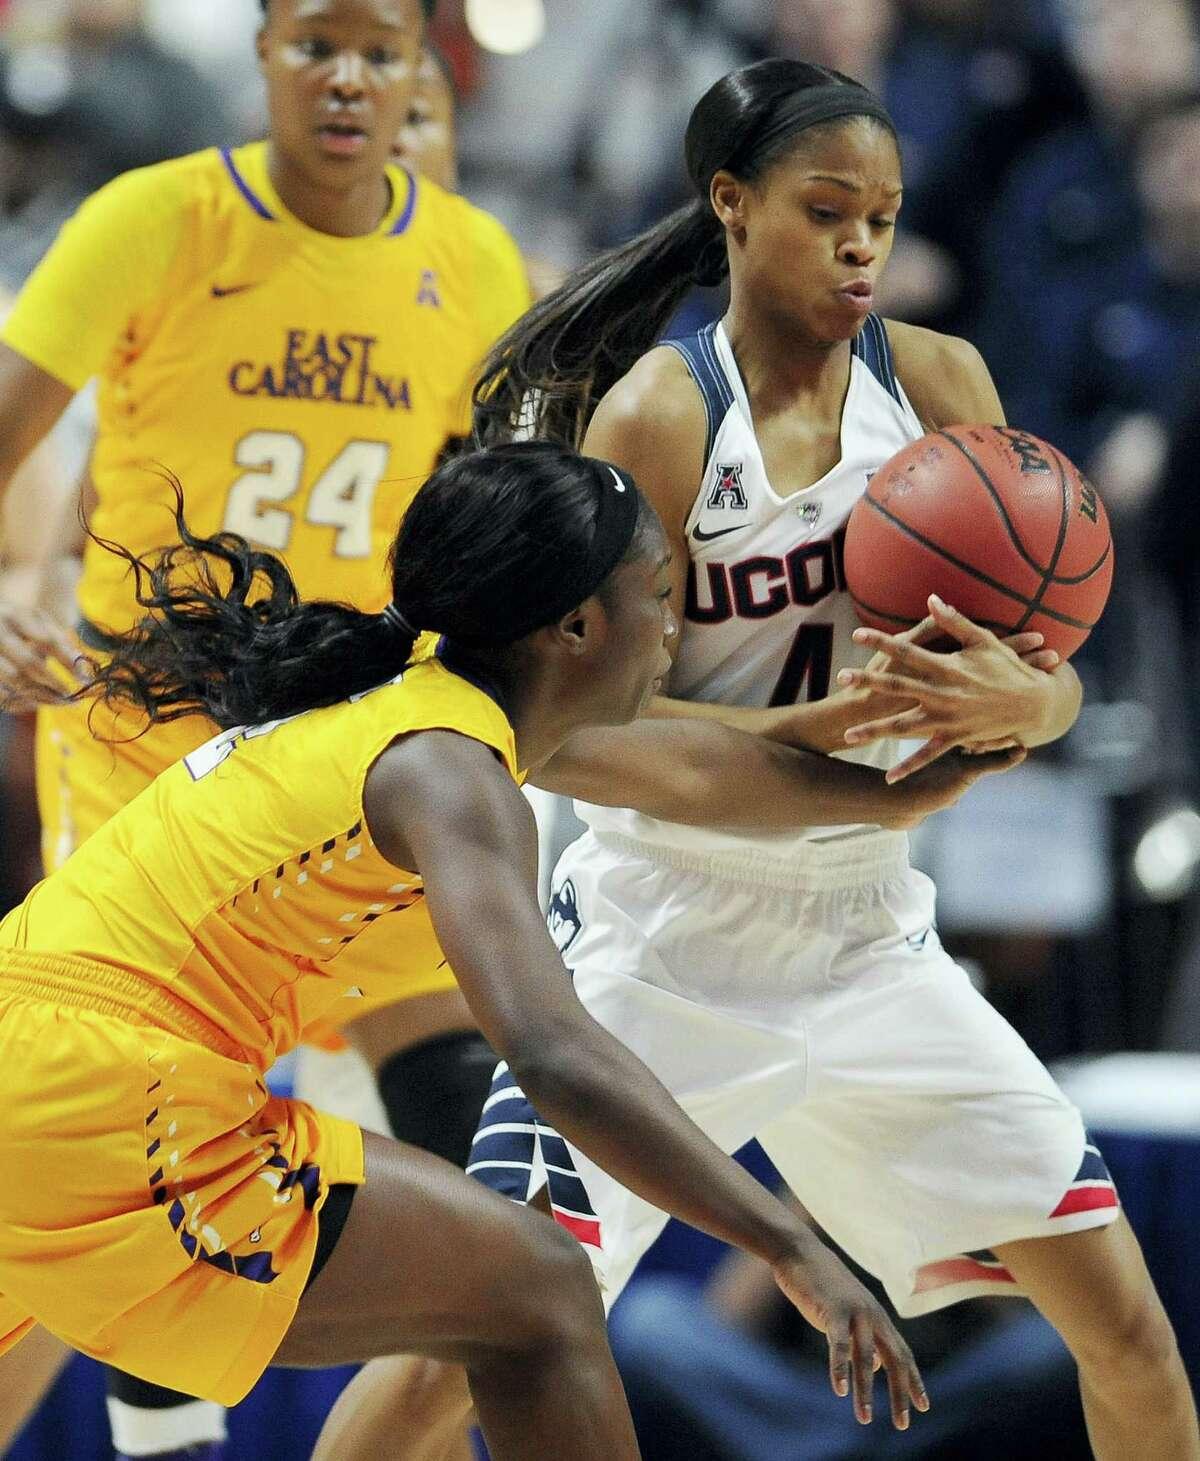 UConn's Moriah Jefferson, right, steals the ball from East Carolina's Khadidja Toure.